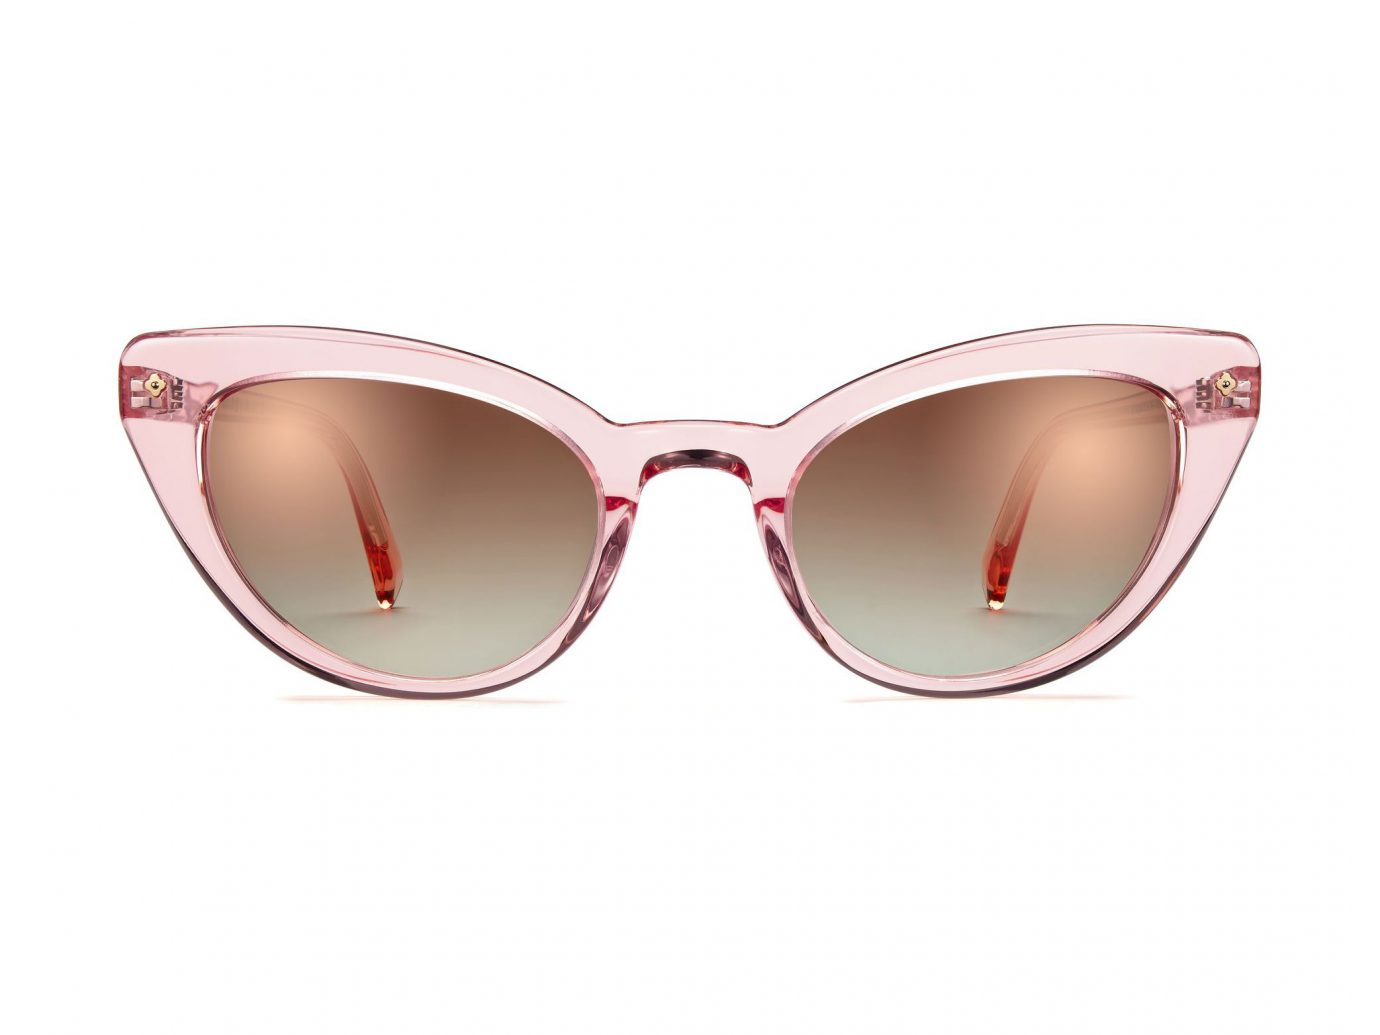 Warby Parker Evelina Sunglasses